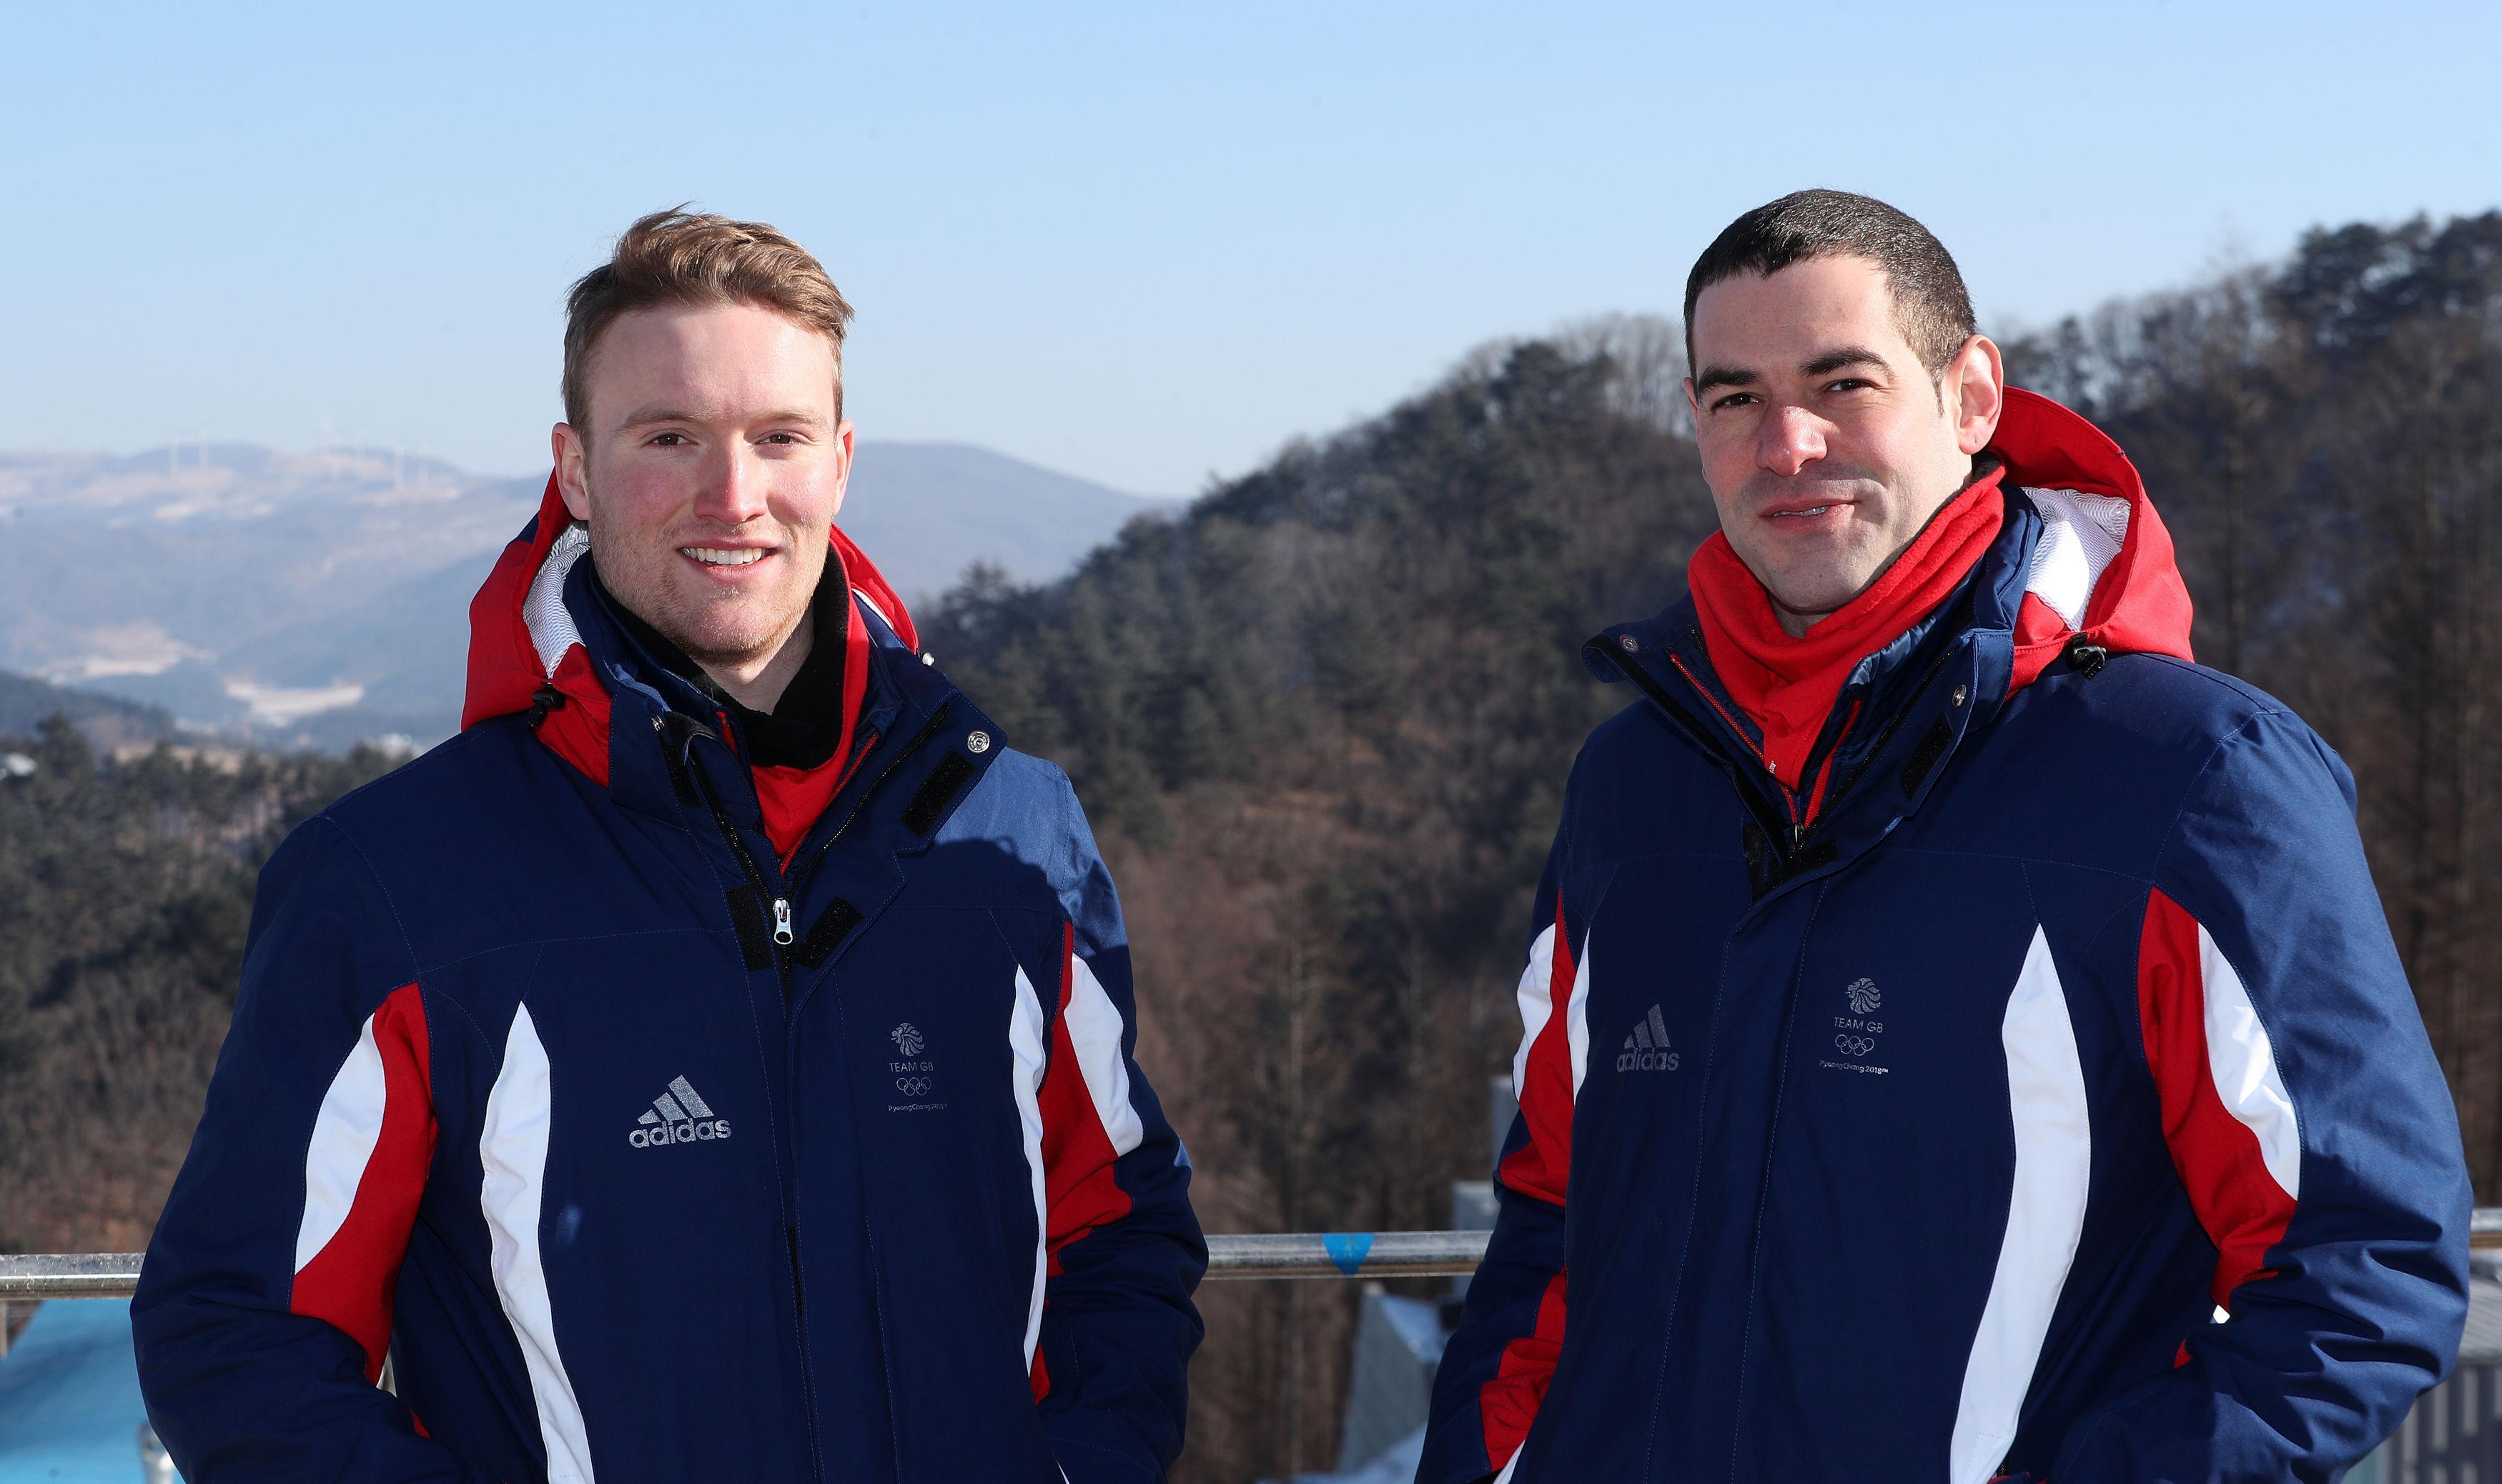 Rupert Staudinger (left) will be competing at his first Winter Olympics alongside veteran Adam Rosen